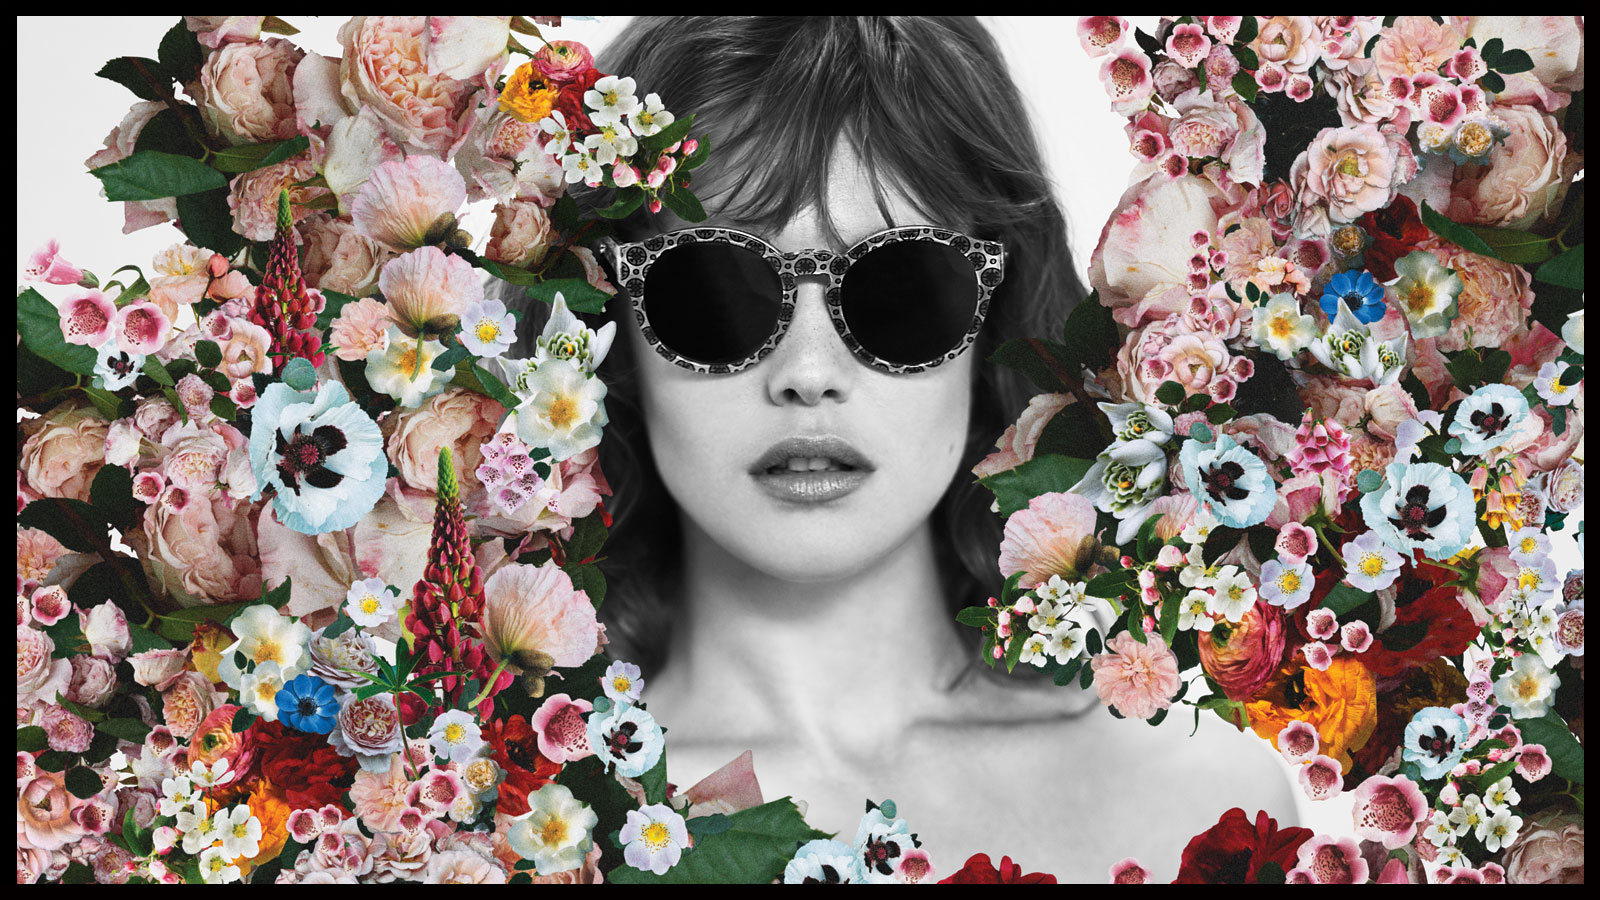 http://1.bp.blogspot.com/-nHopdU34Mkc/TyQvIg6pa0I/AAAAAAAABT4/i6FCgjCmmfk/s1600/Natalia+Vodianova+by+Mert+&+Marcus+(Stella+McCartney+Pepe+Spring-Summer+2012)+2.jpg